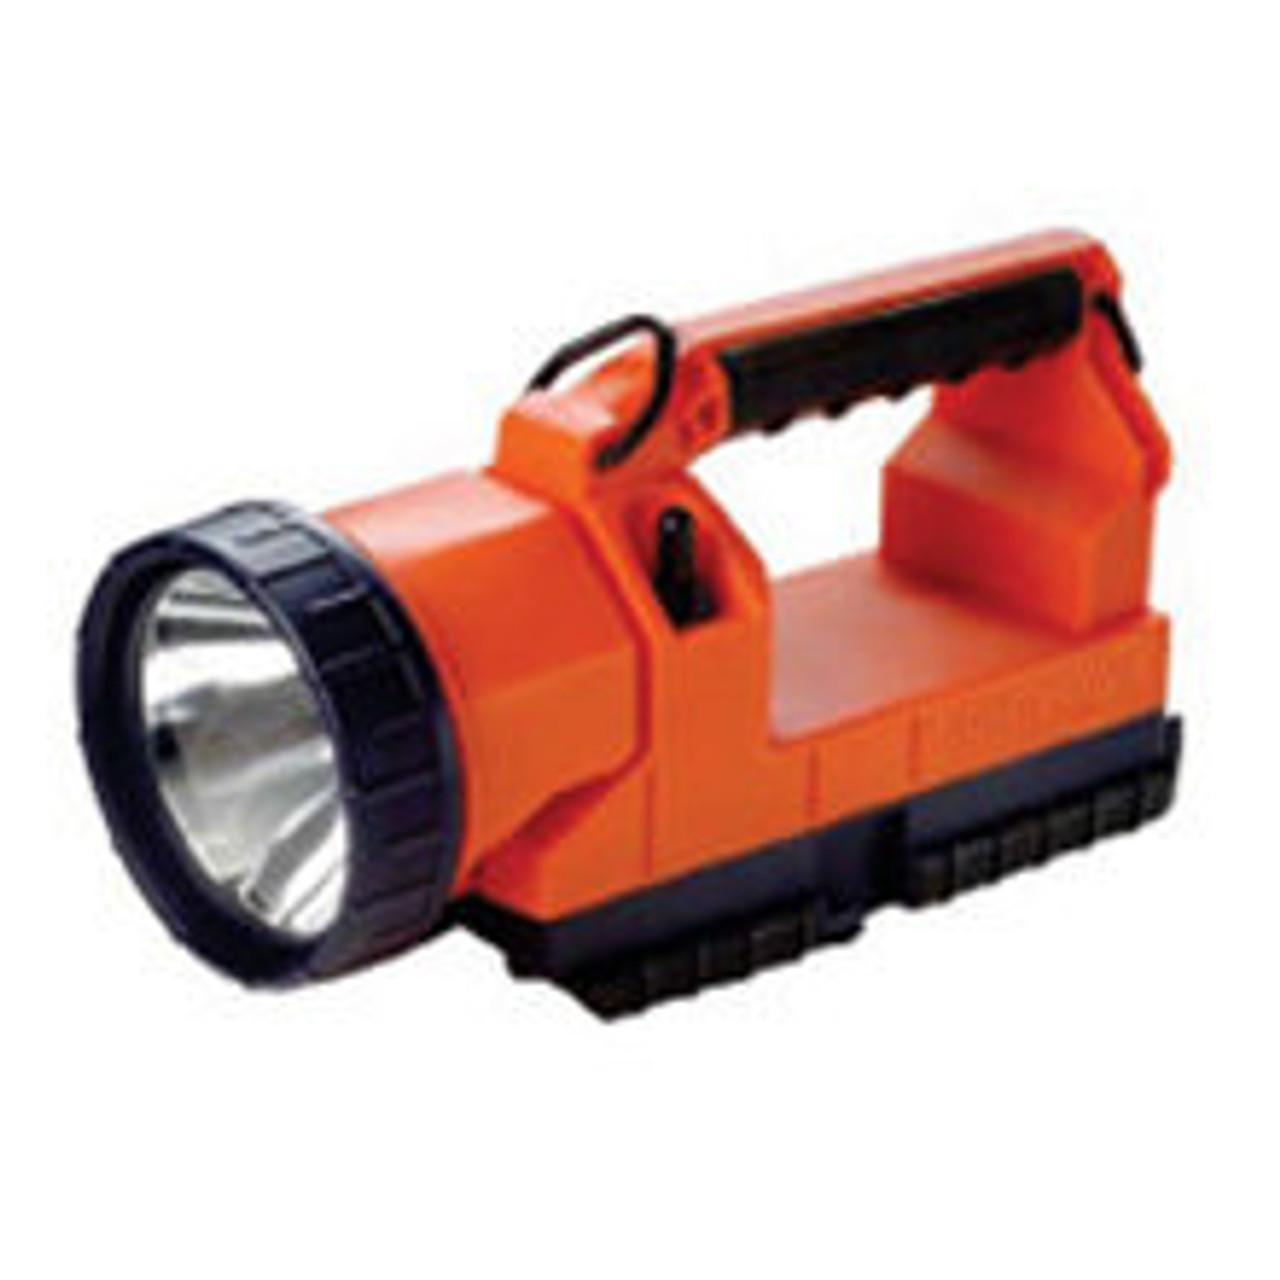 Lighthawk | 4-Cell Fire Lantern Orange with 120V AC